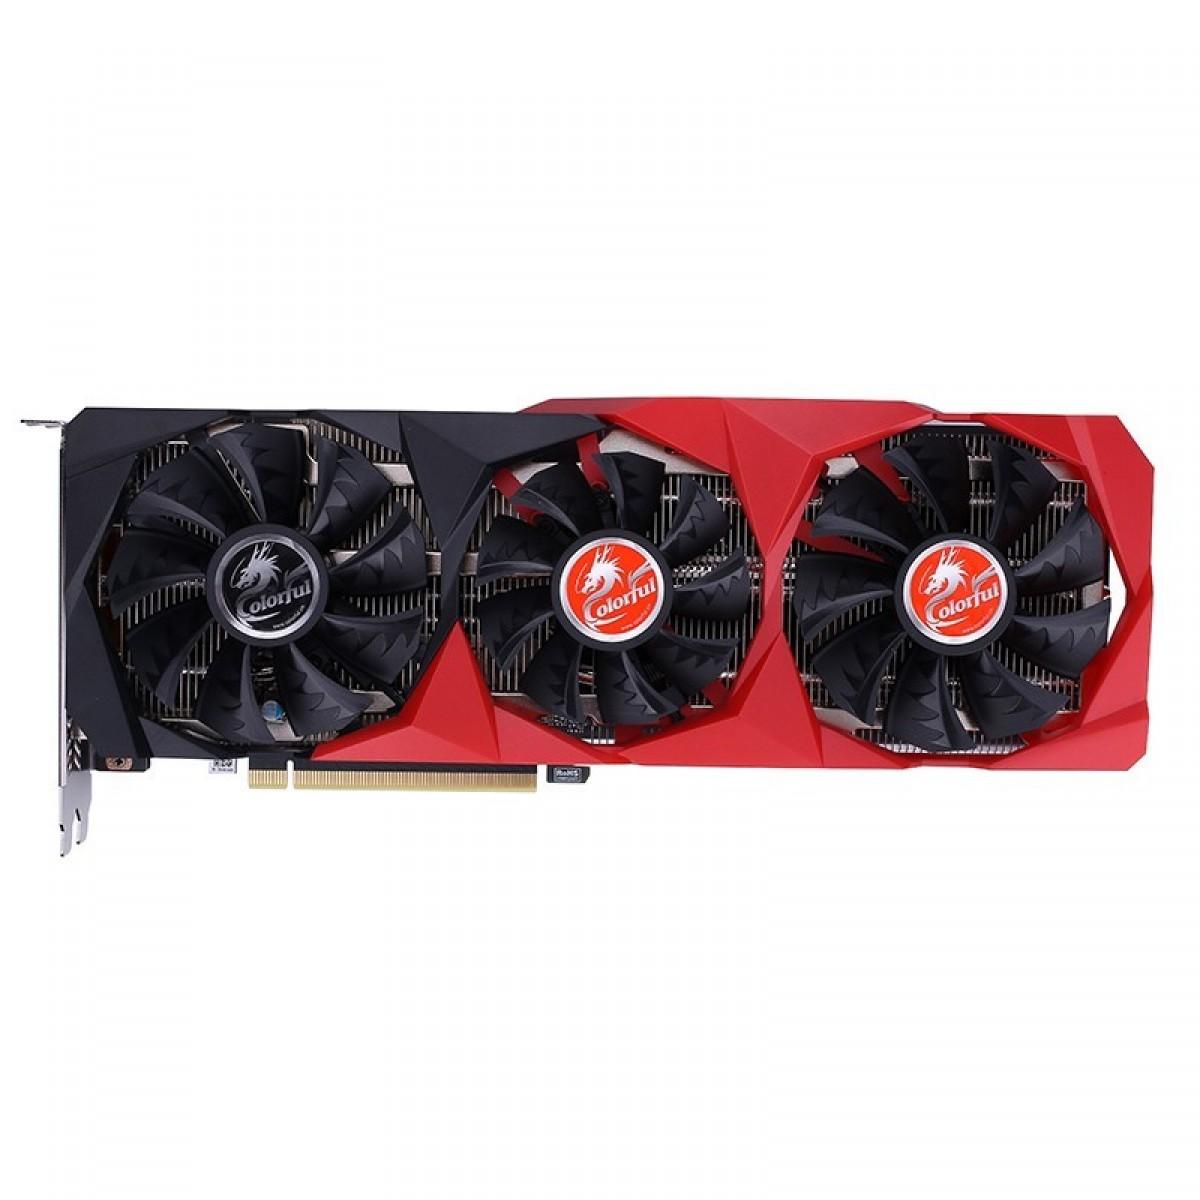 Placa de Vídeo Colorful, GeForce RTX 3060 NB-V, 12GB, GDDR6, 192Bit, 212327117806 - Open Box